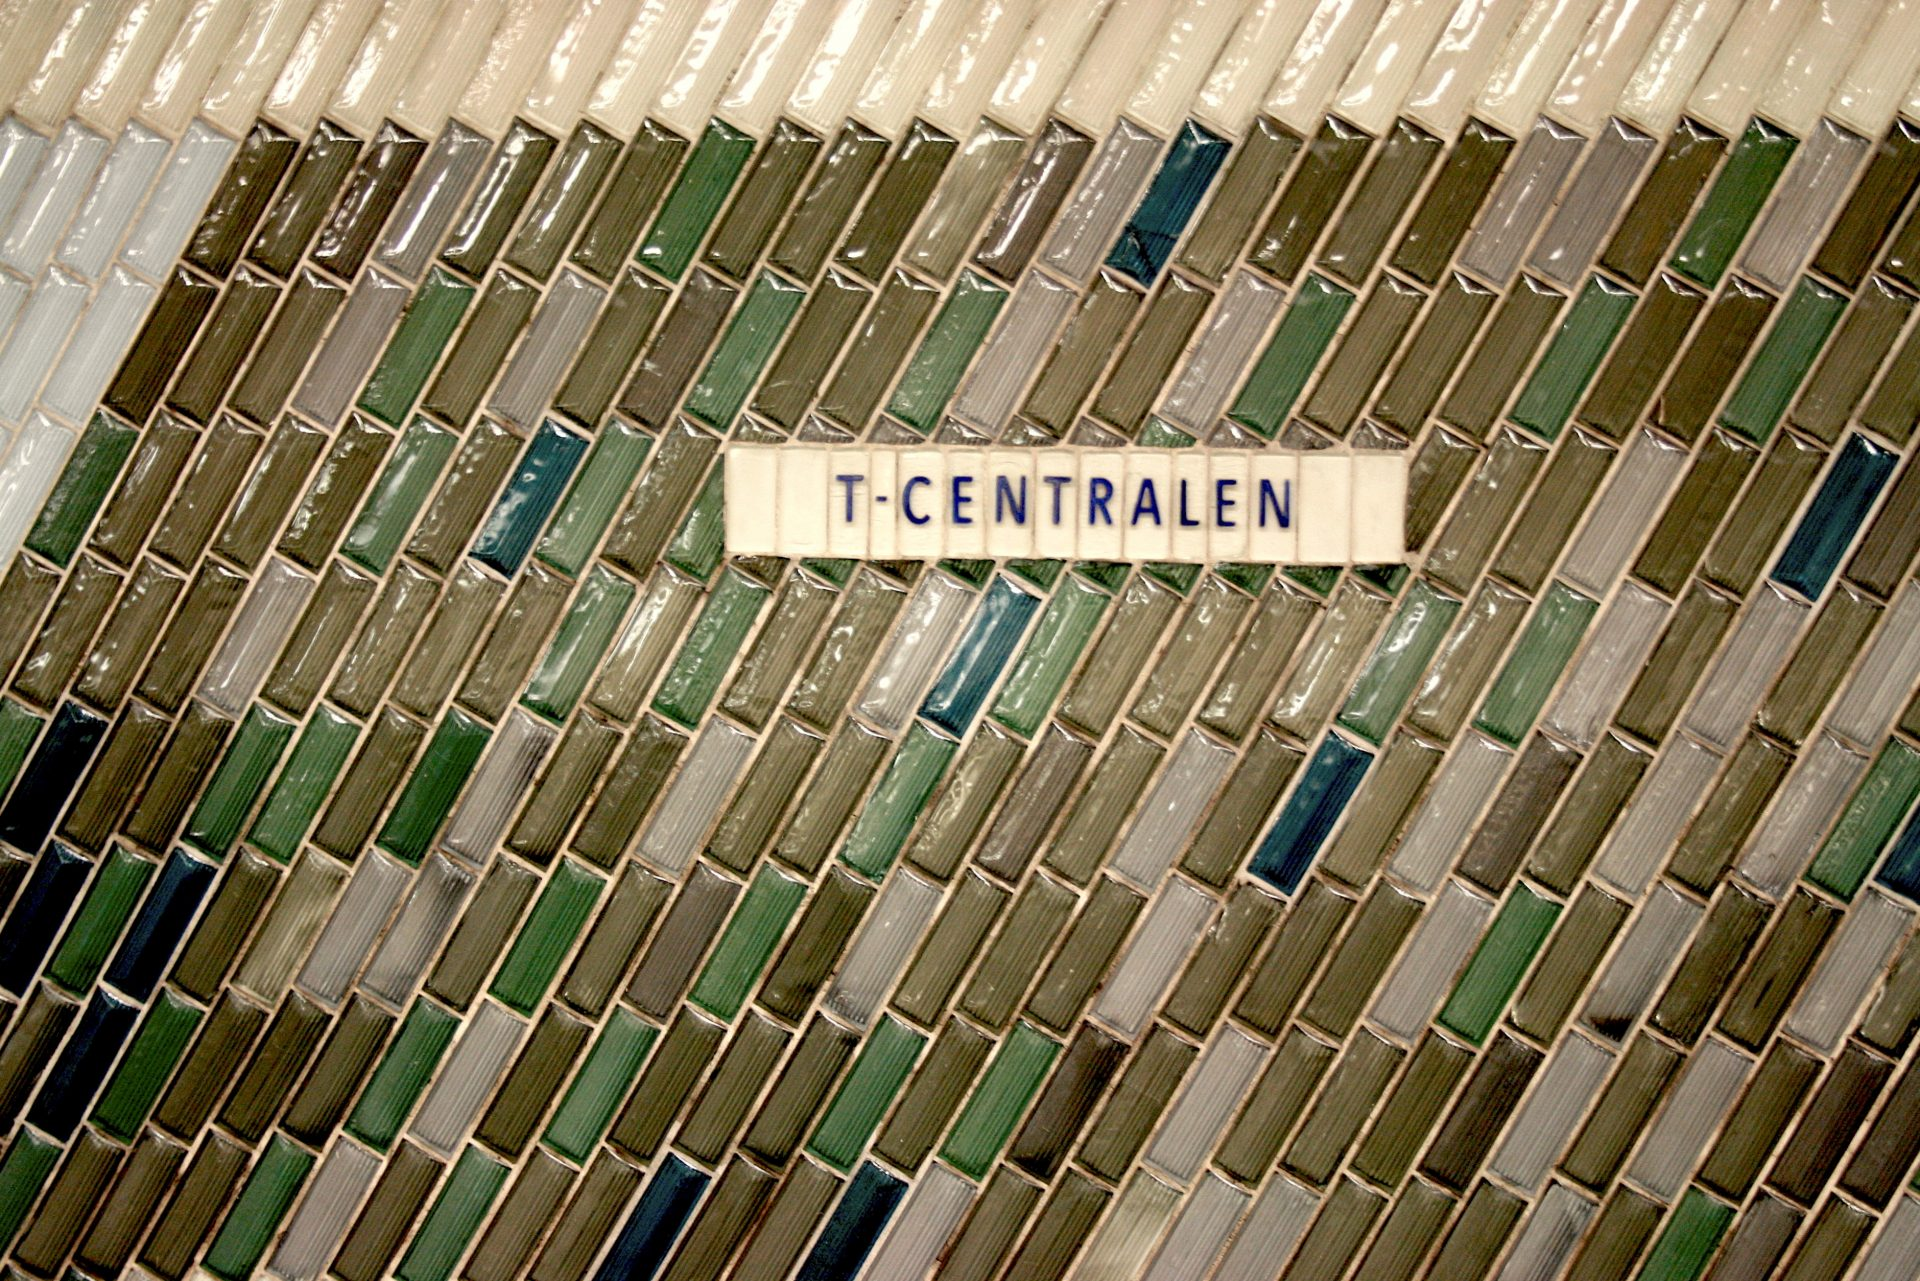 t_centralen_2_2592